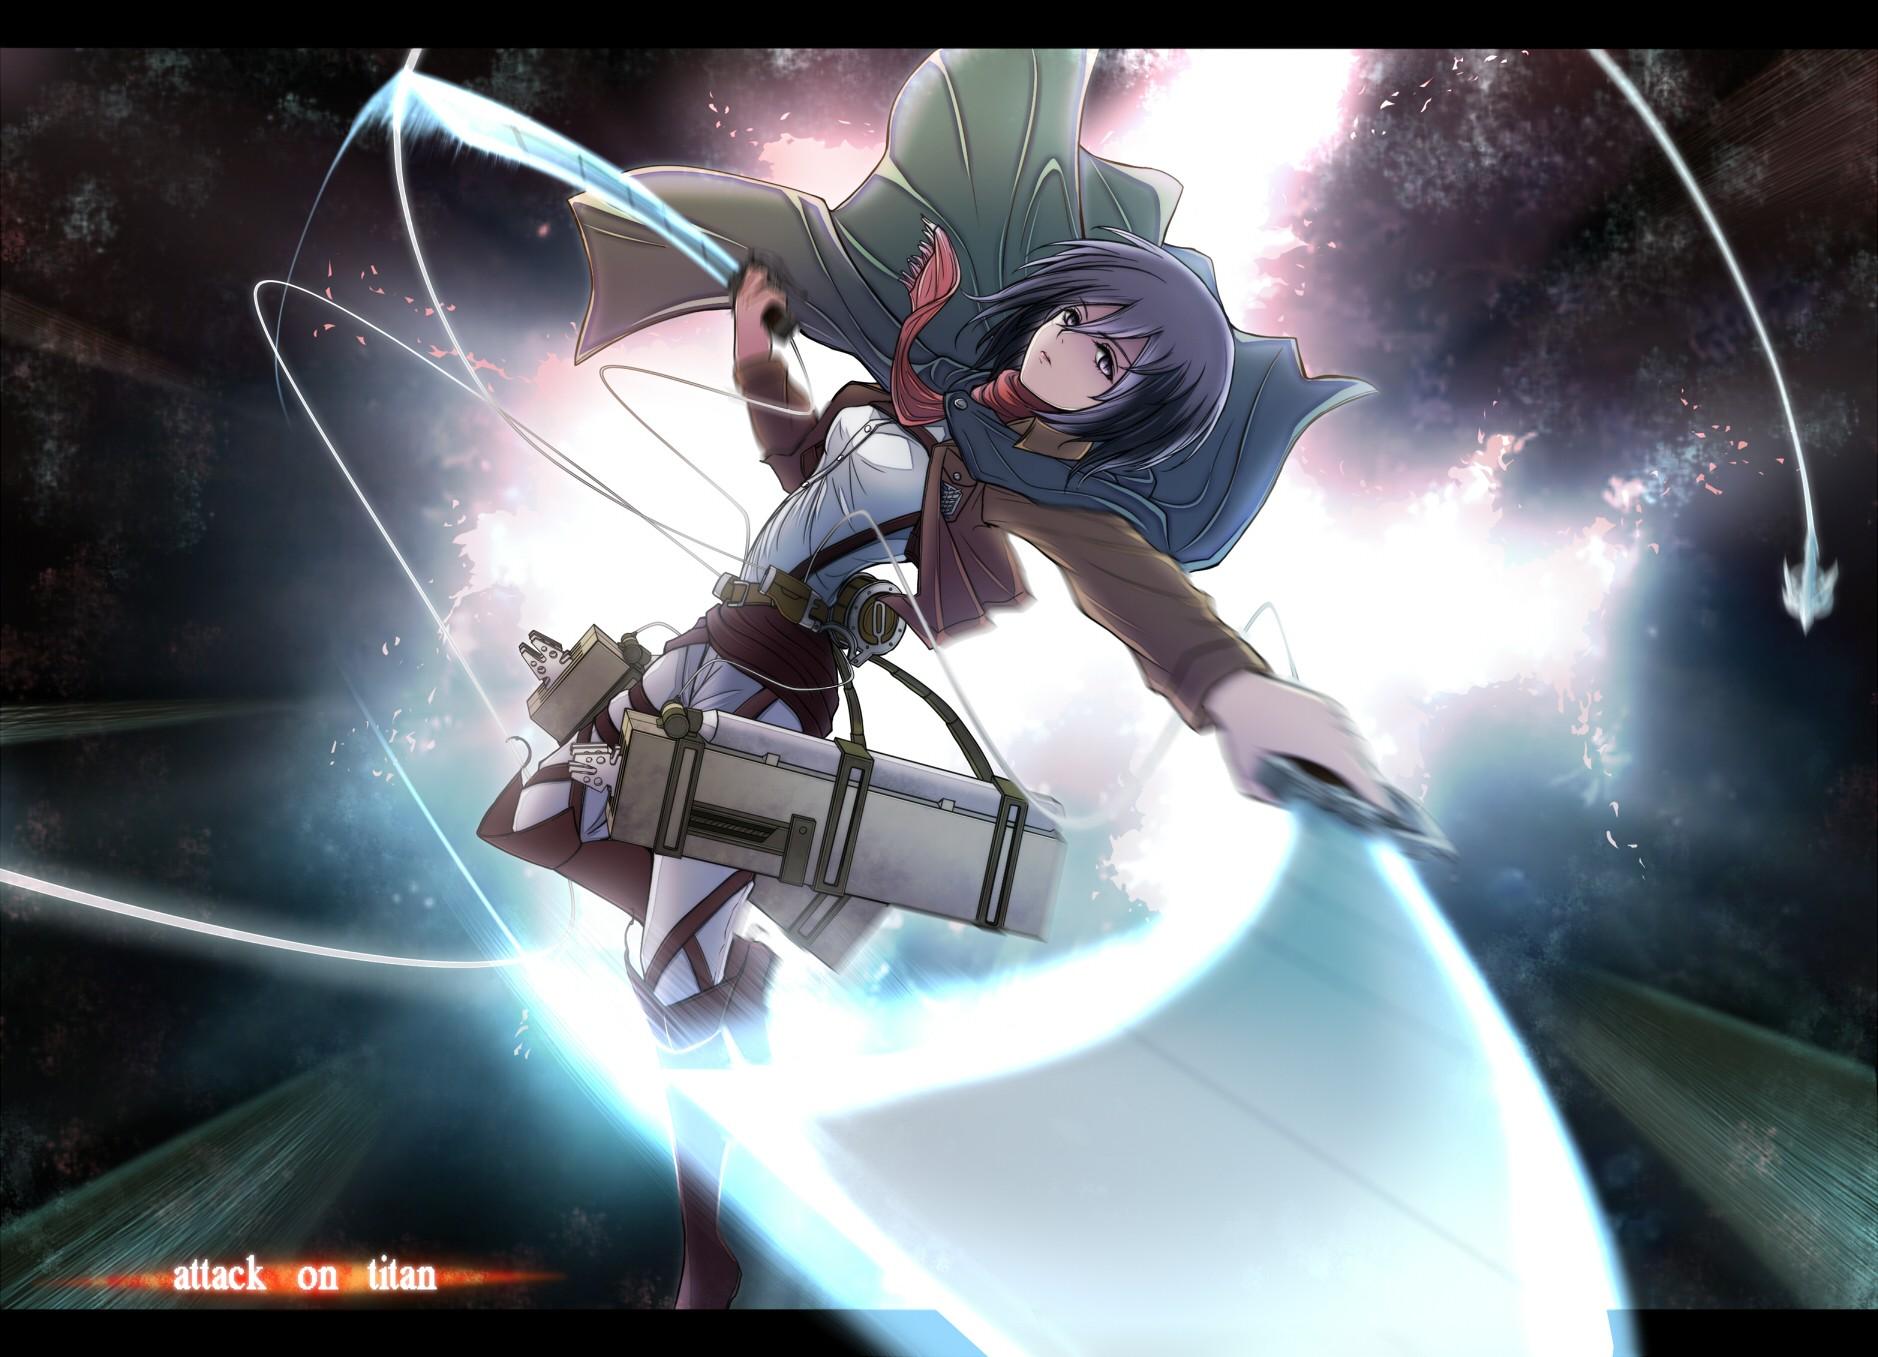 Wallpaper Anime Girls Shingeki No Kyojin Mikasa Ackerman Screenshot Mecha Computer Wallpaper Pc Game 1878x1357 Nosing 174928 Hd Wallpapers Wallhere